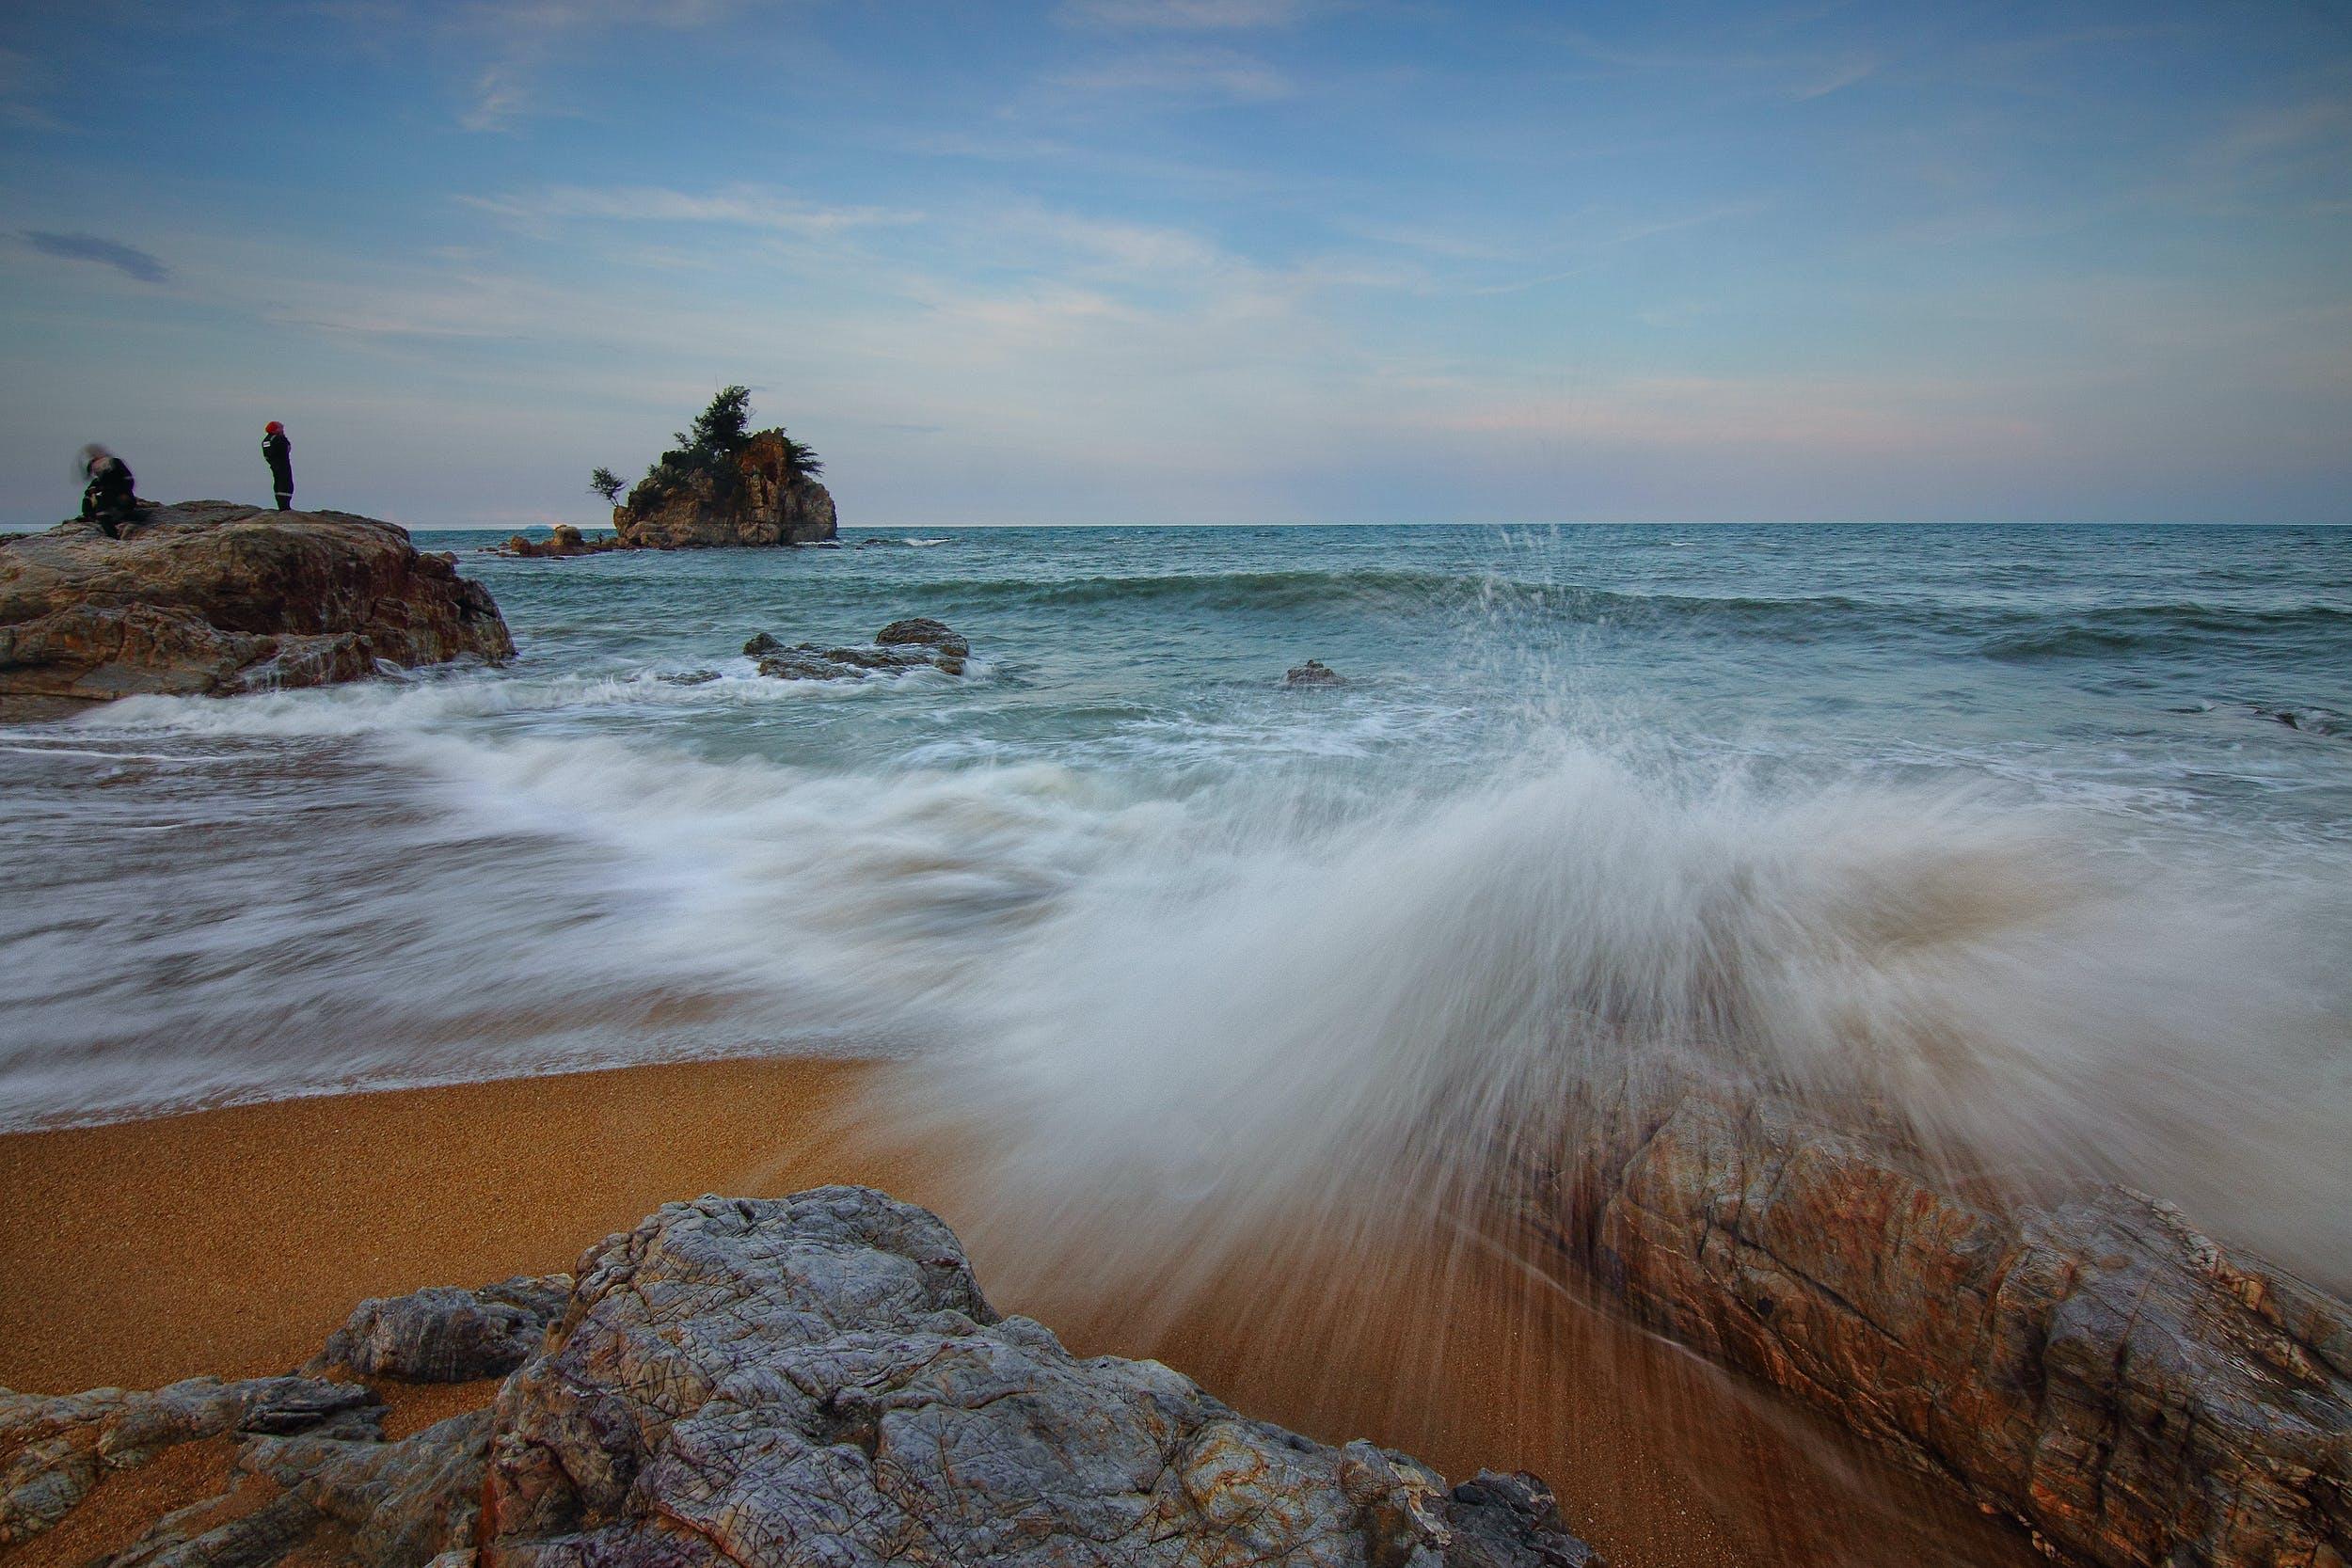 Ocean Waves Crushing on Shore